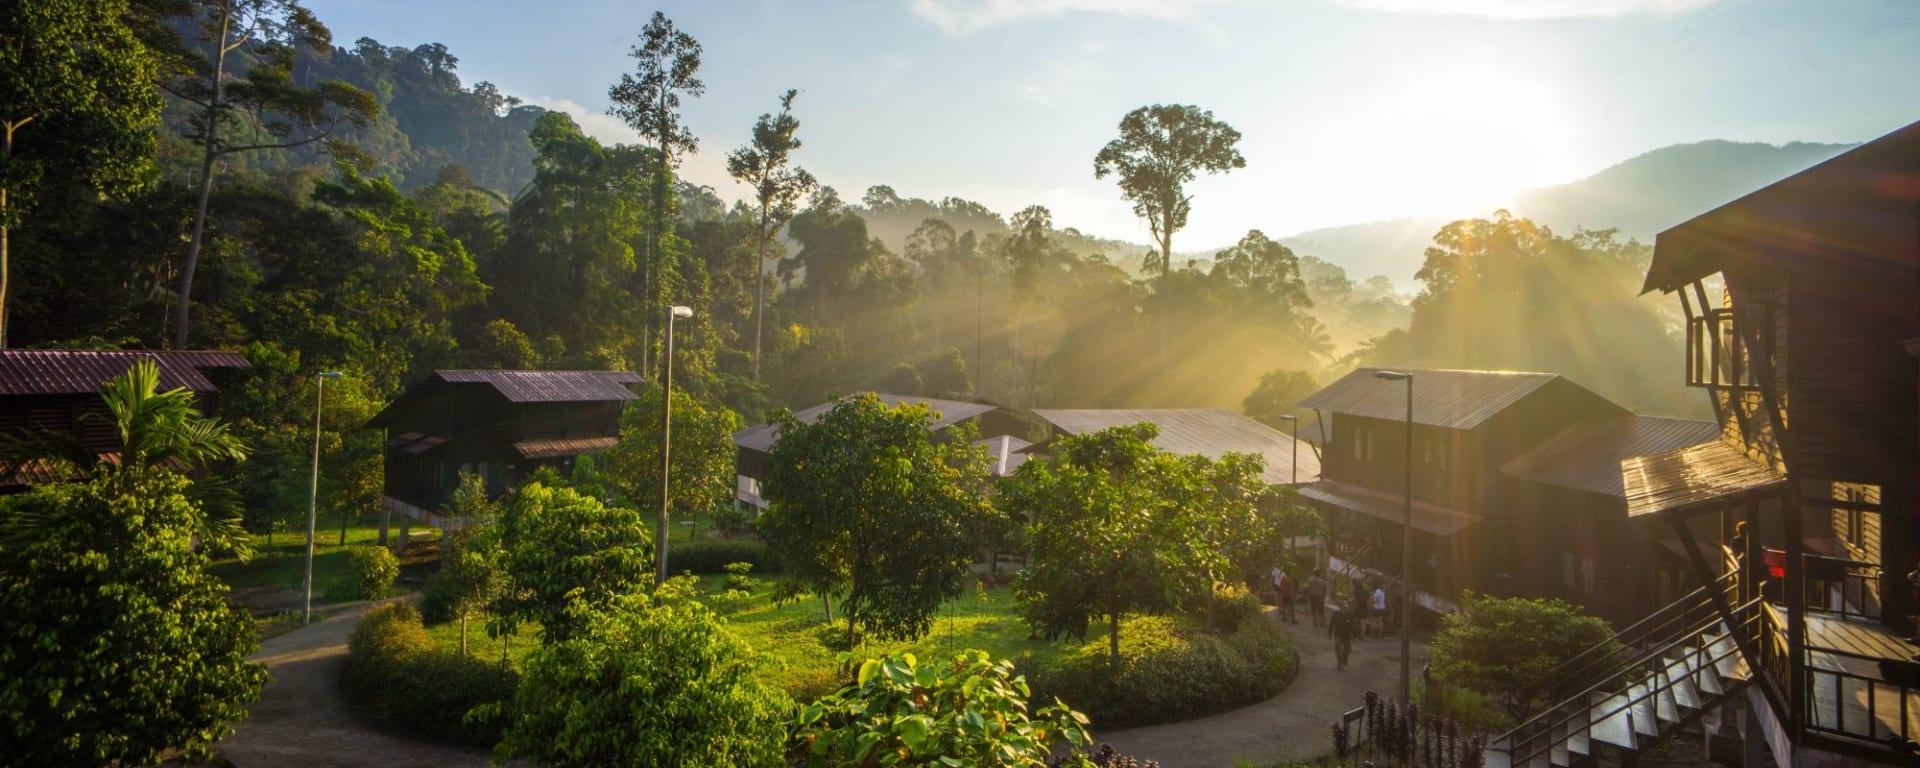 Malaisie authentique de Kuala Lumpur: Taman Negara in the morning